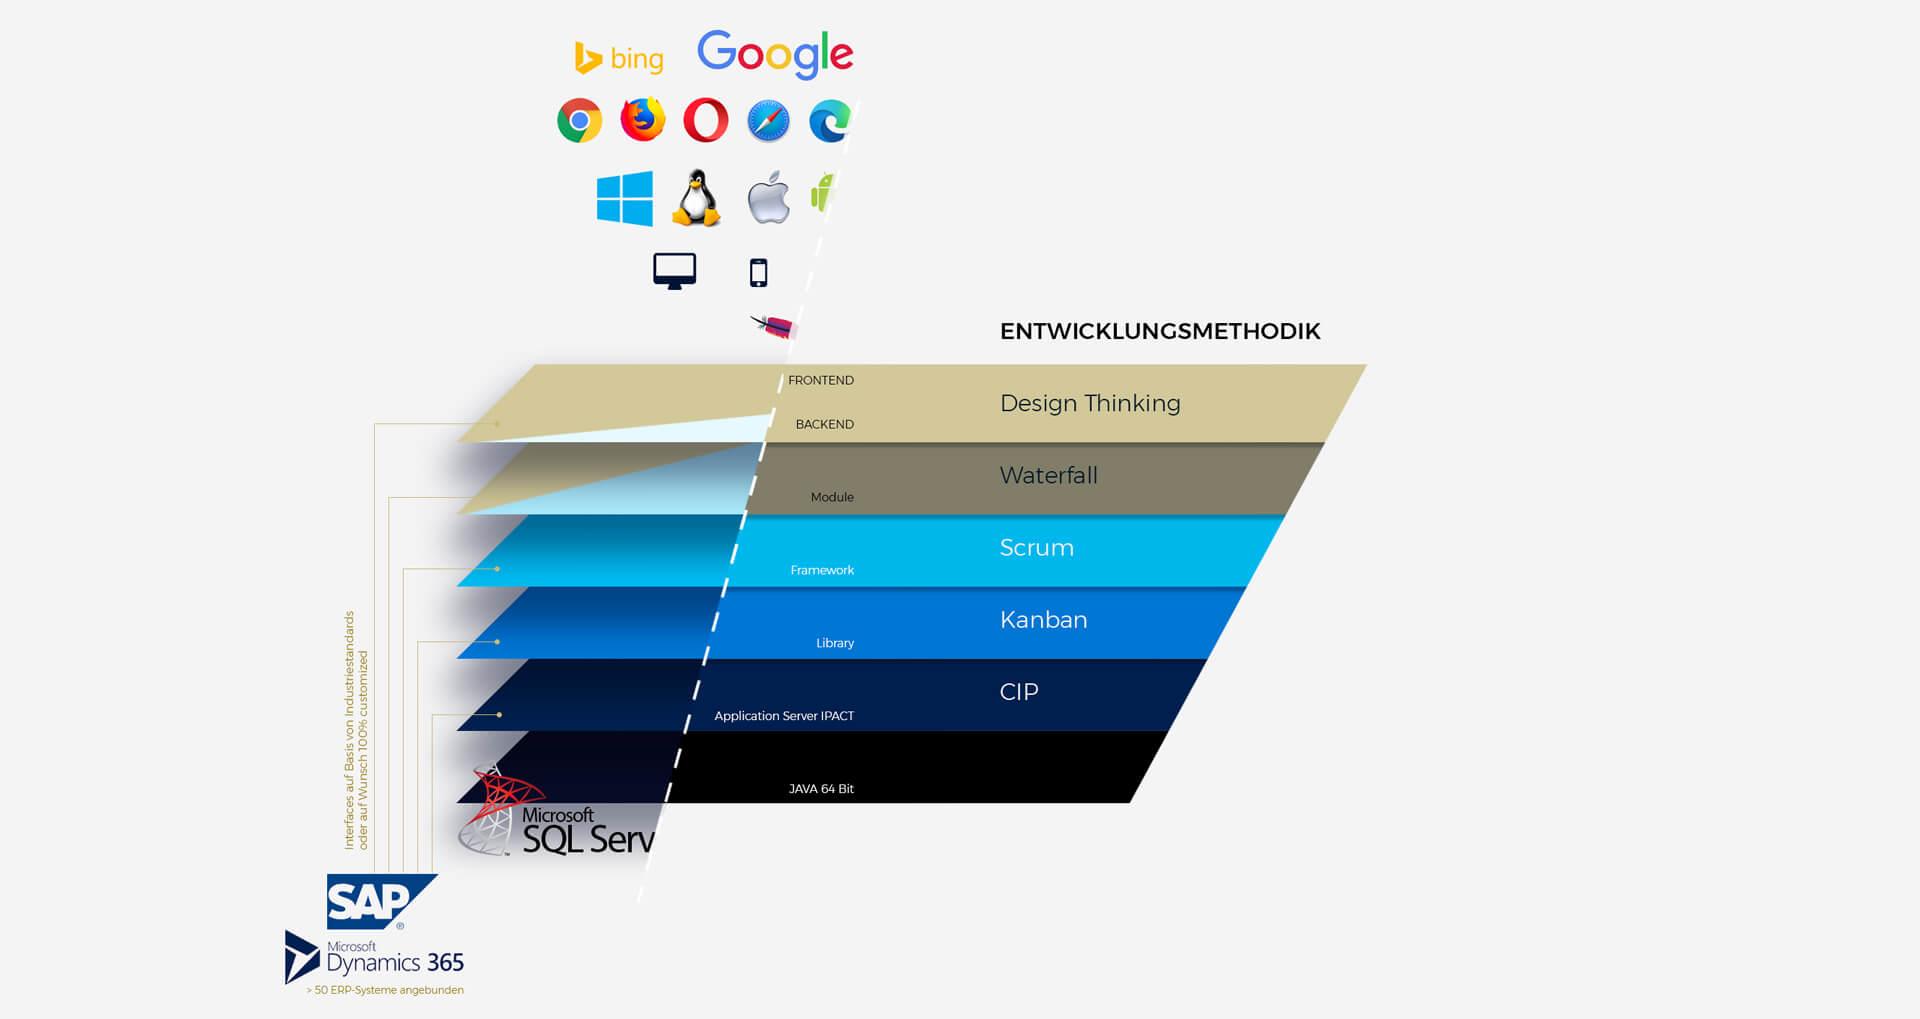 Software Entwicklungsmethodik by ICONPARC